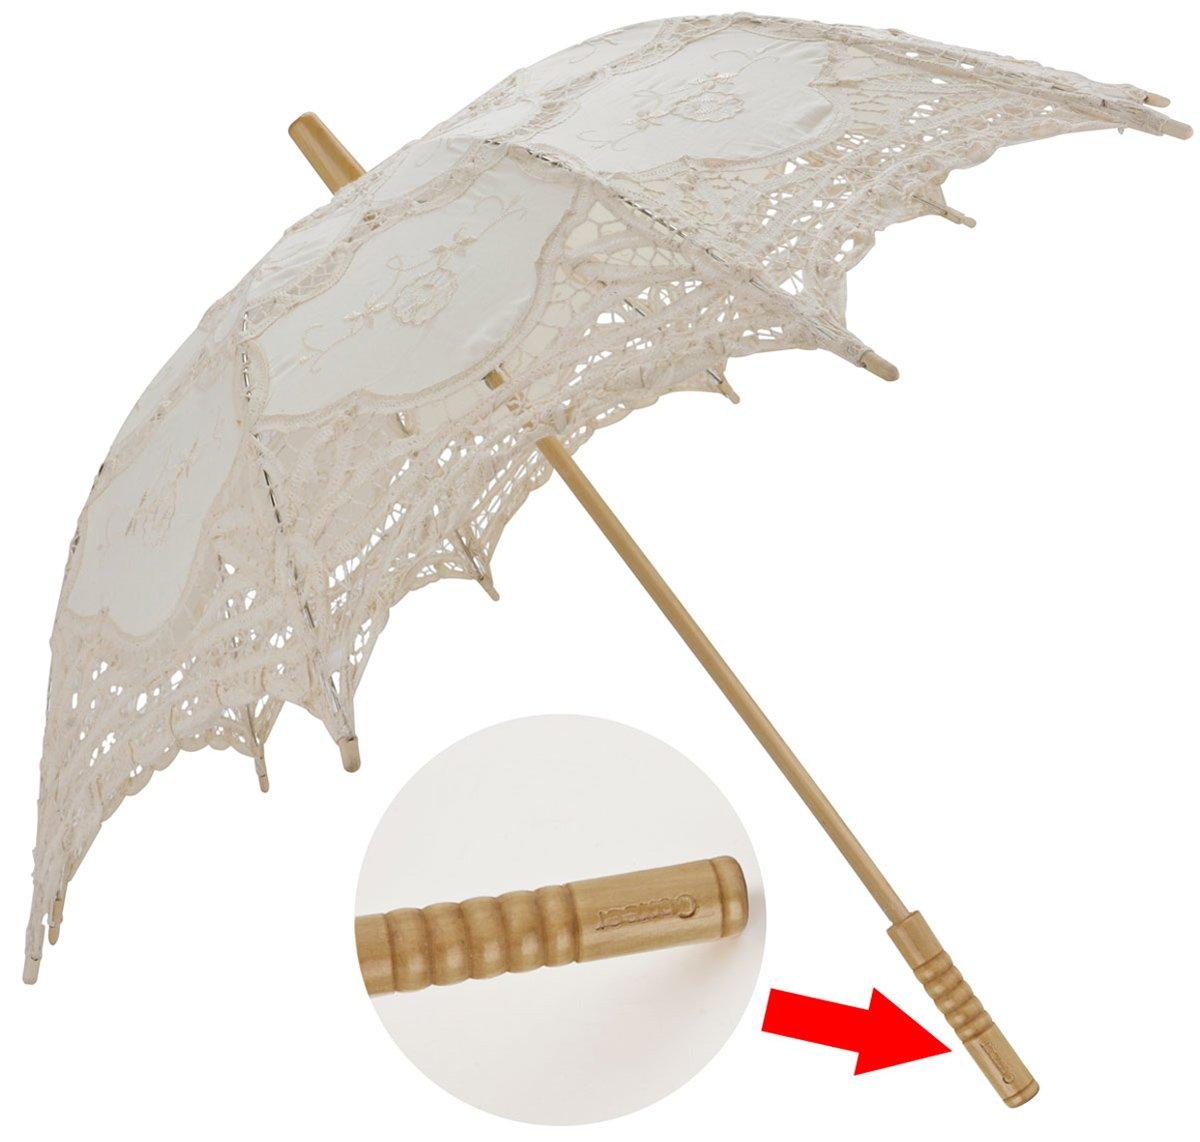 Leegoal Handmade Umbrellas for Bridal Bridesmaid Wedding Decoration, Beige 4